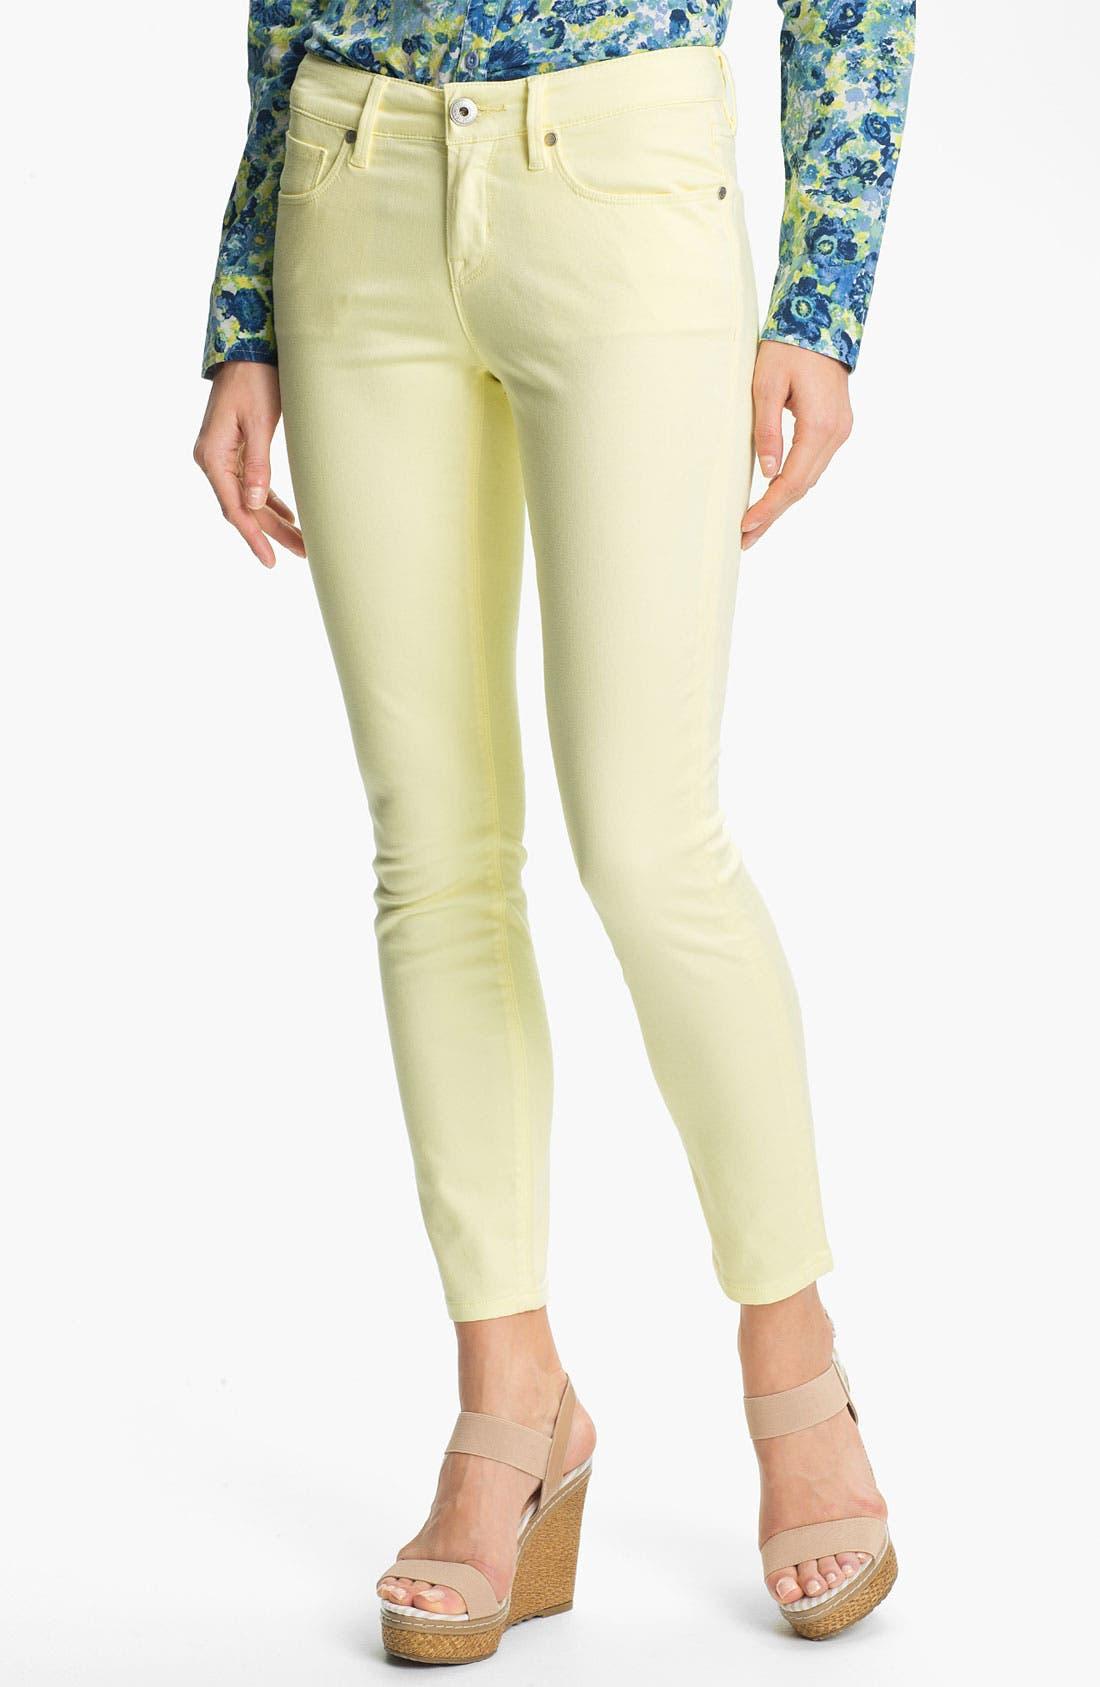 Alternate Image 1 Selected - Isaac Mizrahi Jeans Colored Skinny Jeans